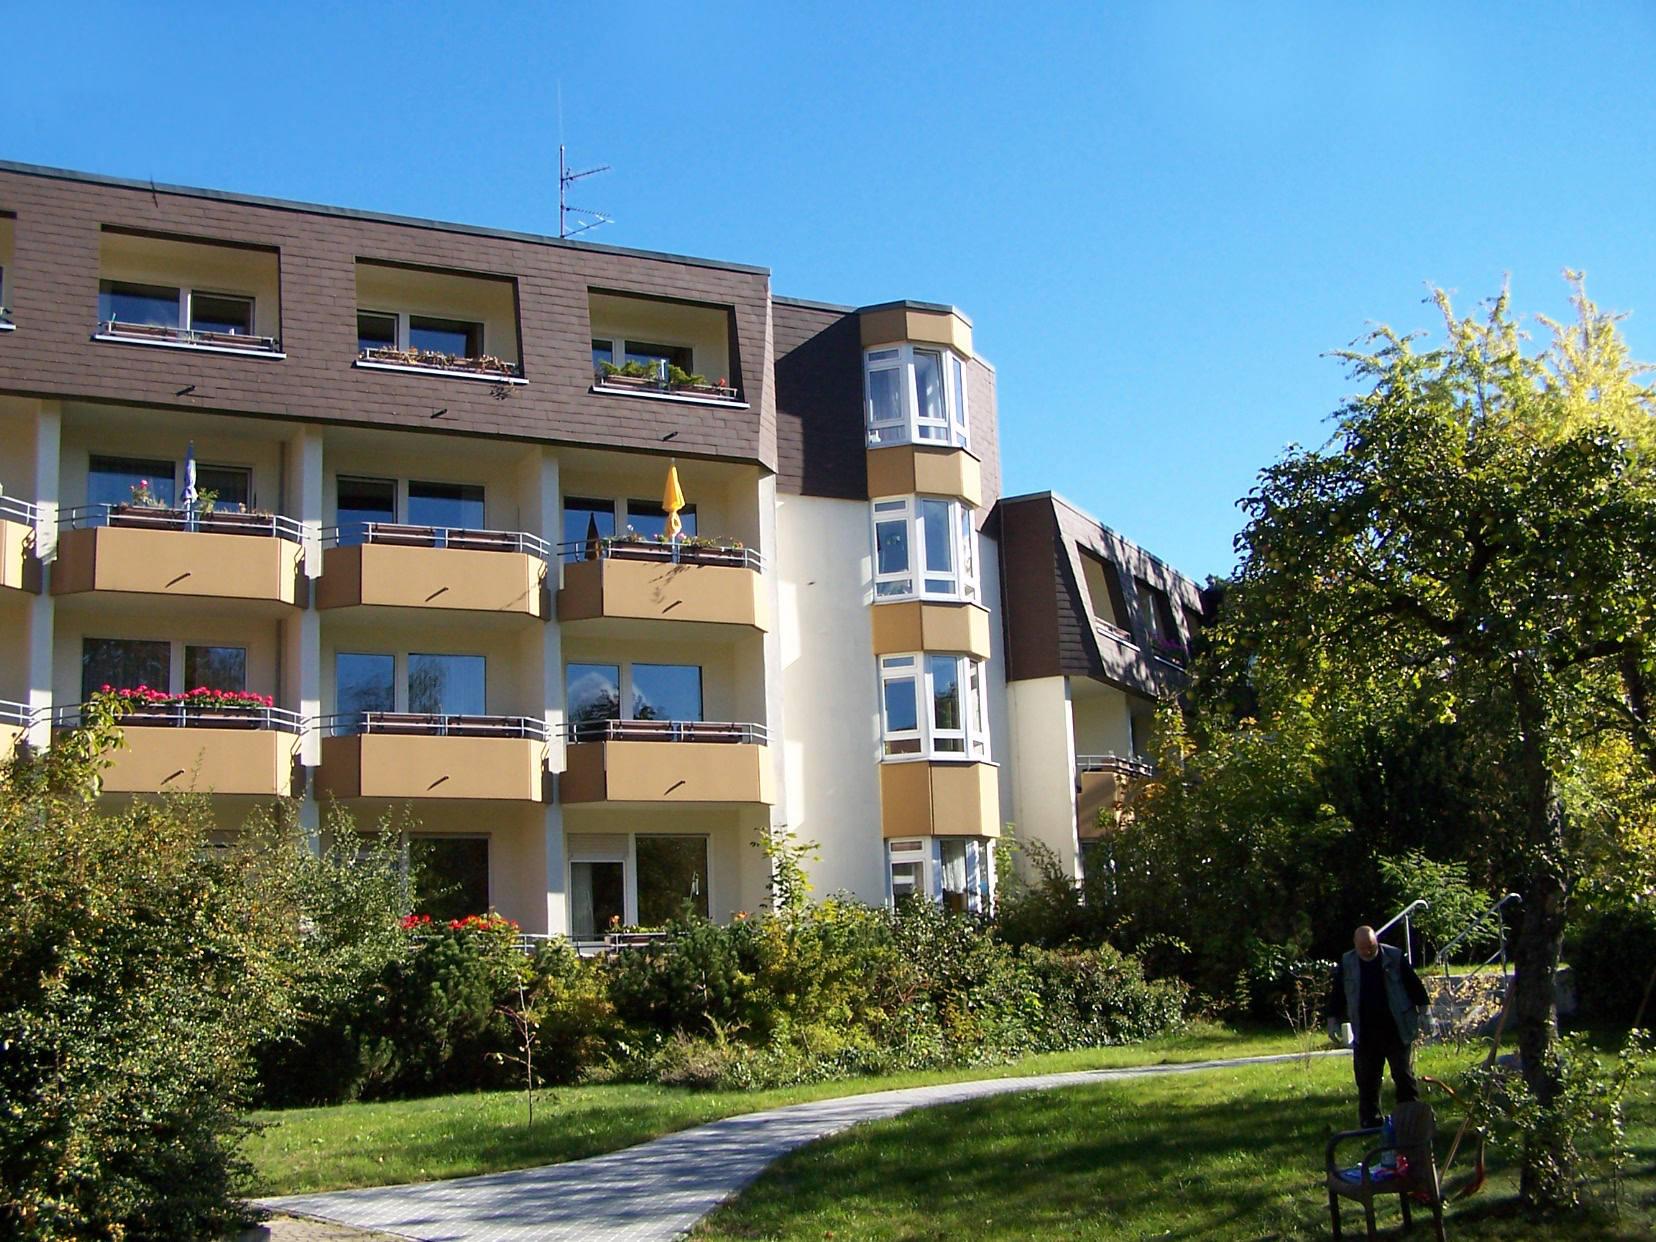 Caritas-Seniorenheim Franz-Jordan Stift